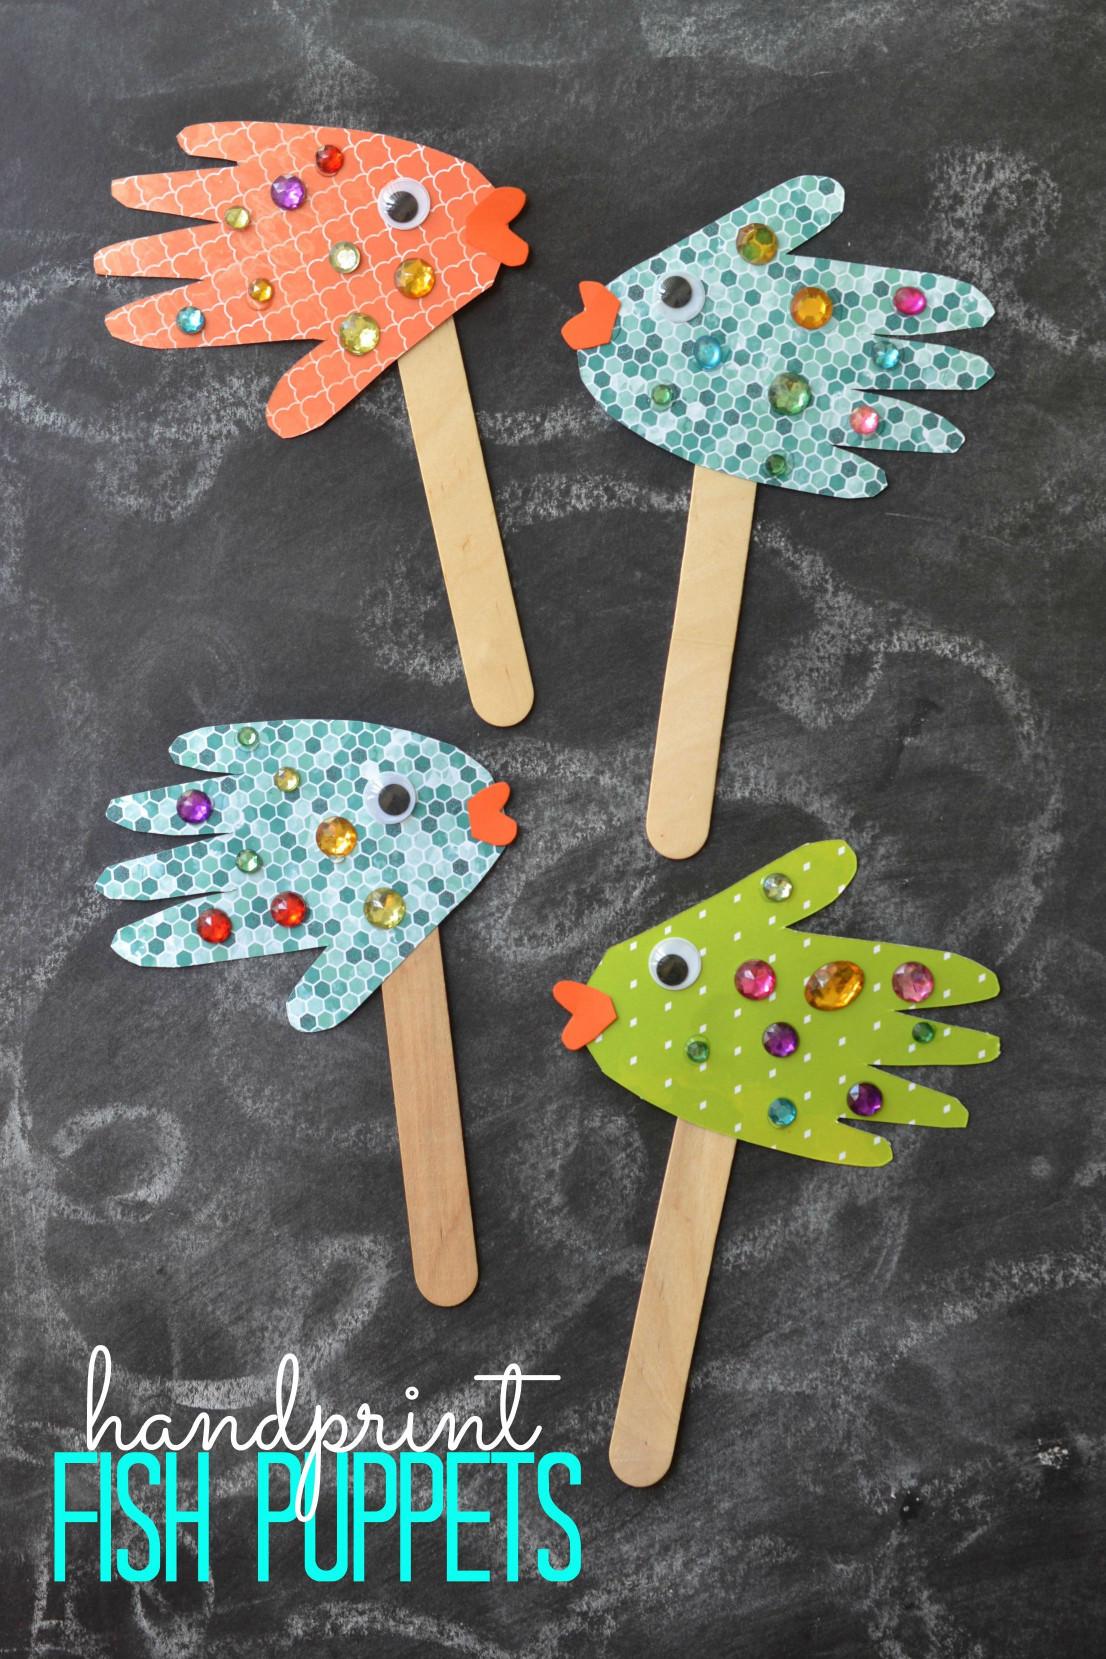 Paper Craft Ideas For Kids Under 5  Easy Kids Craft Handprint Fish Puppets